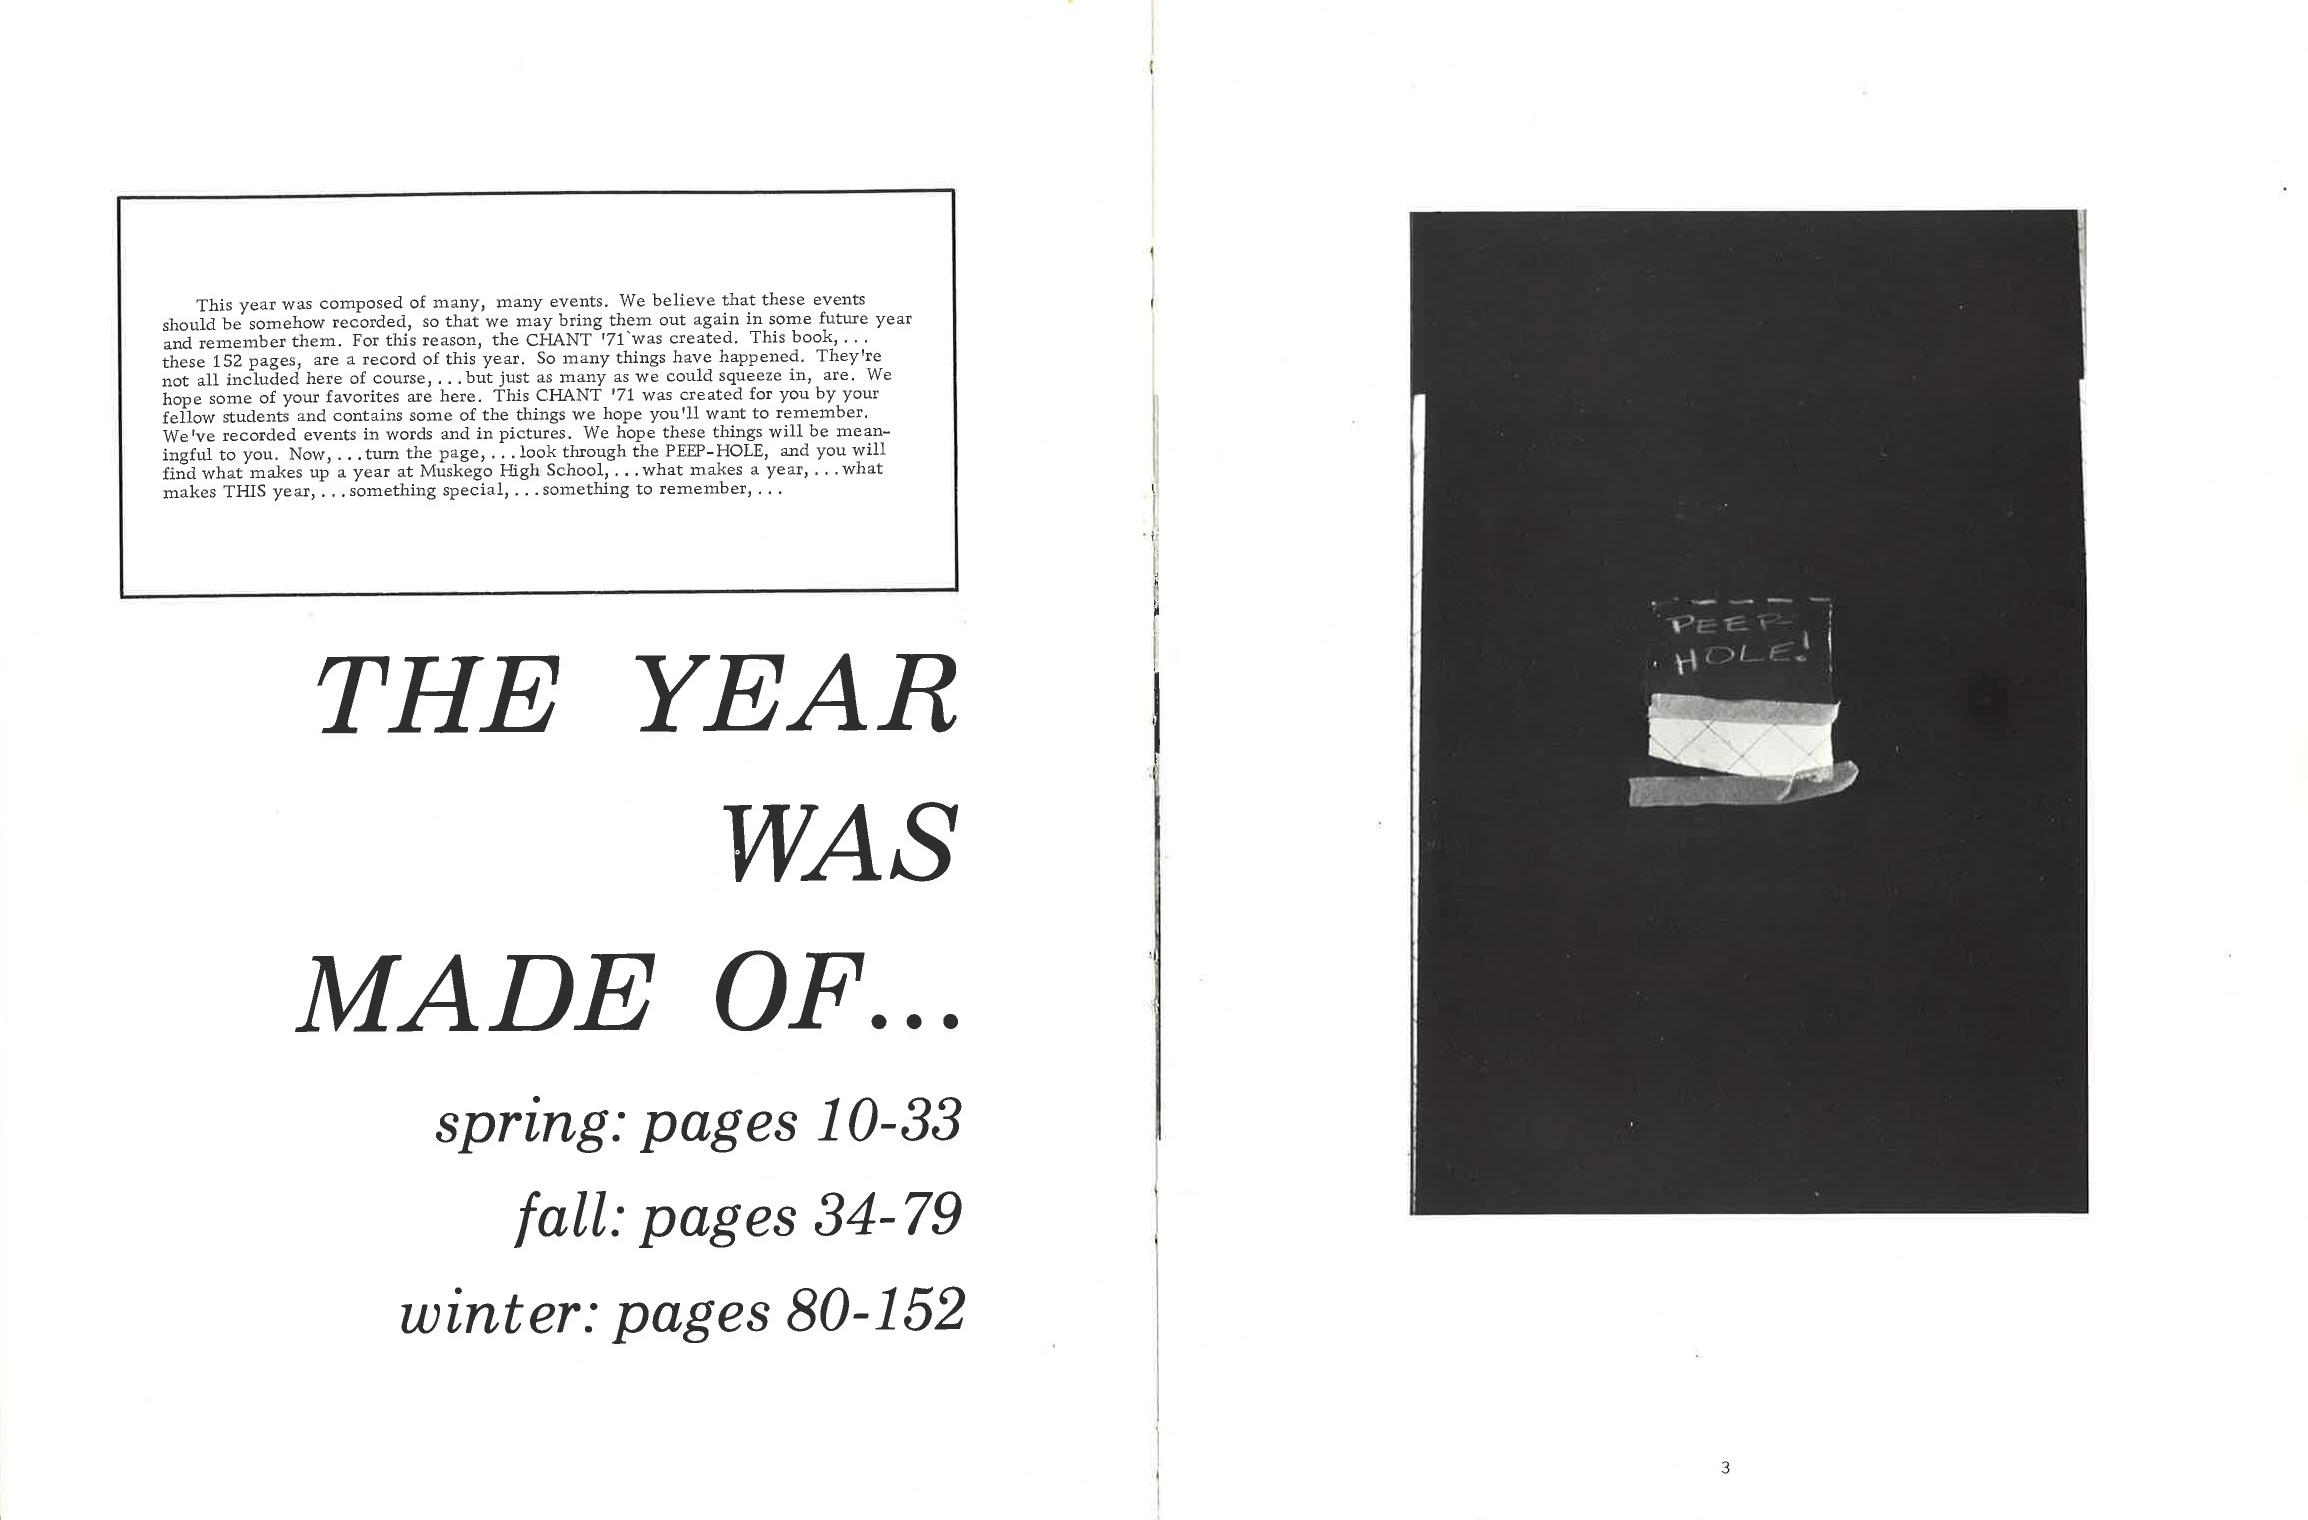 1971_Yearbook_TOC.jpg